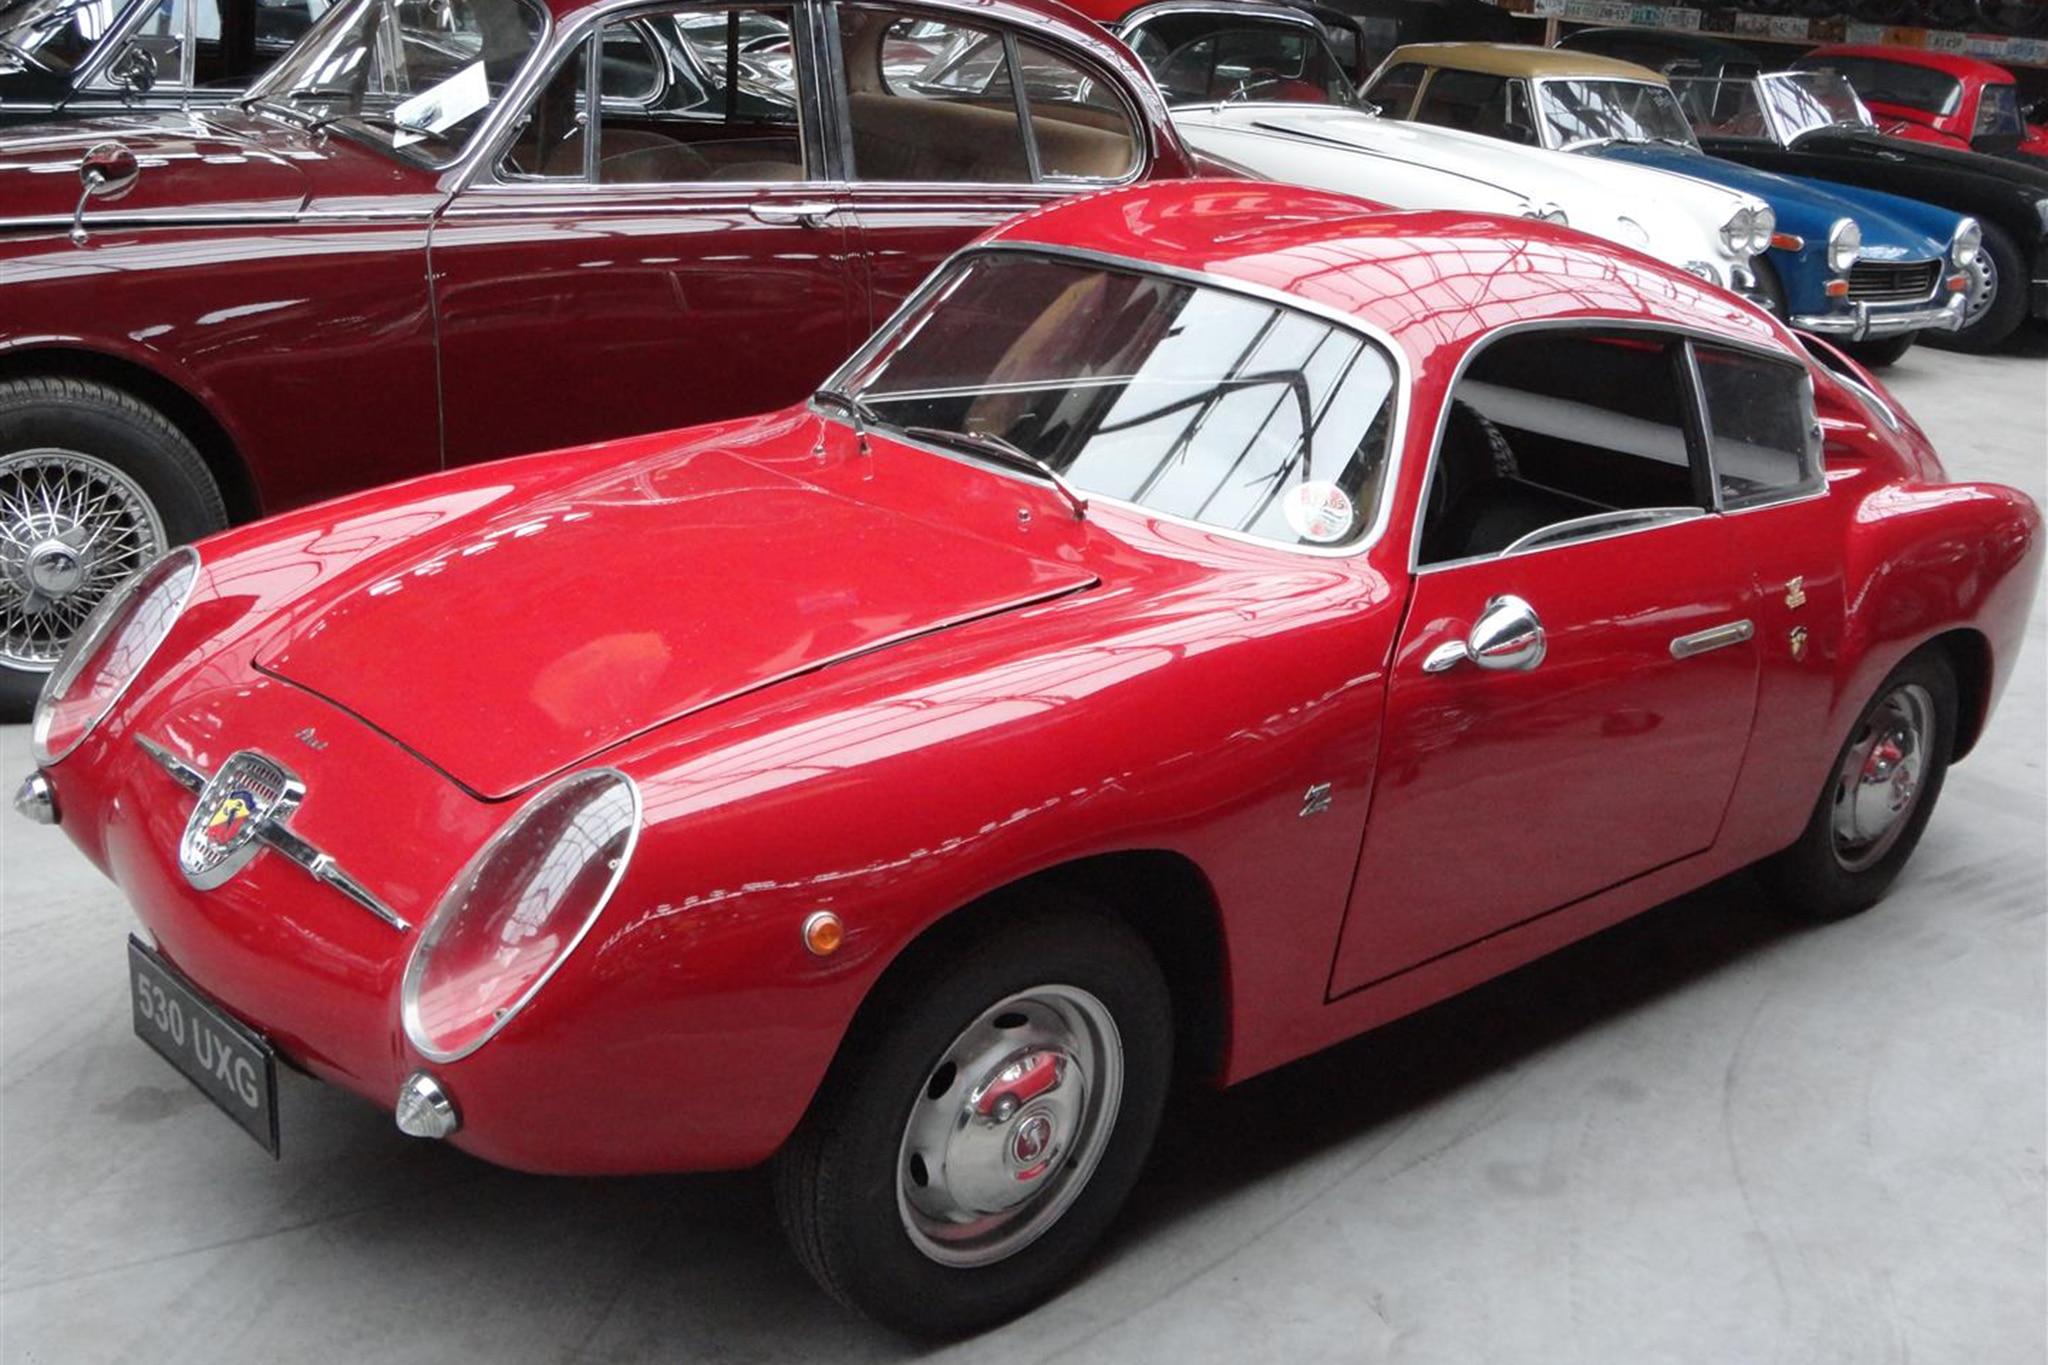 1957 Fiat Abarth 750 Zagato Just Listed Front Three Quarters